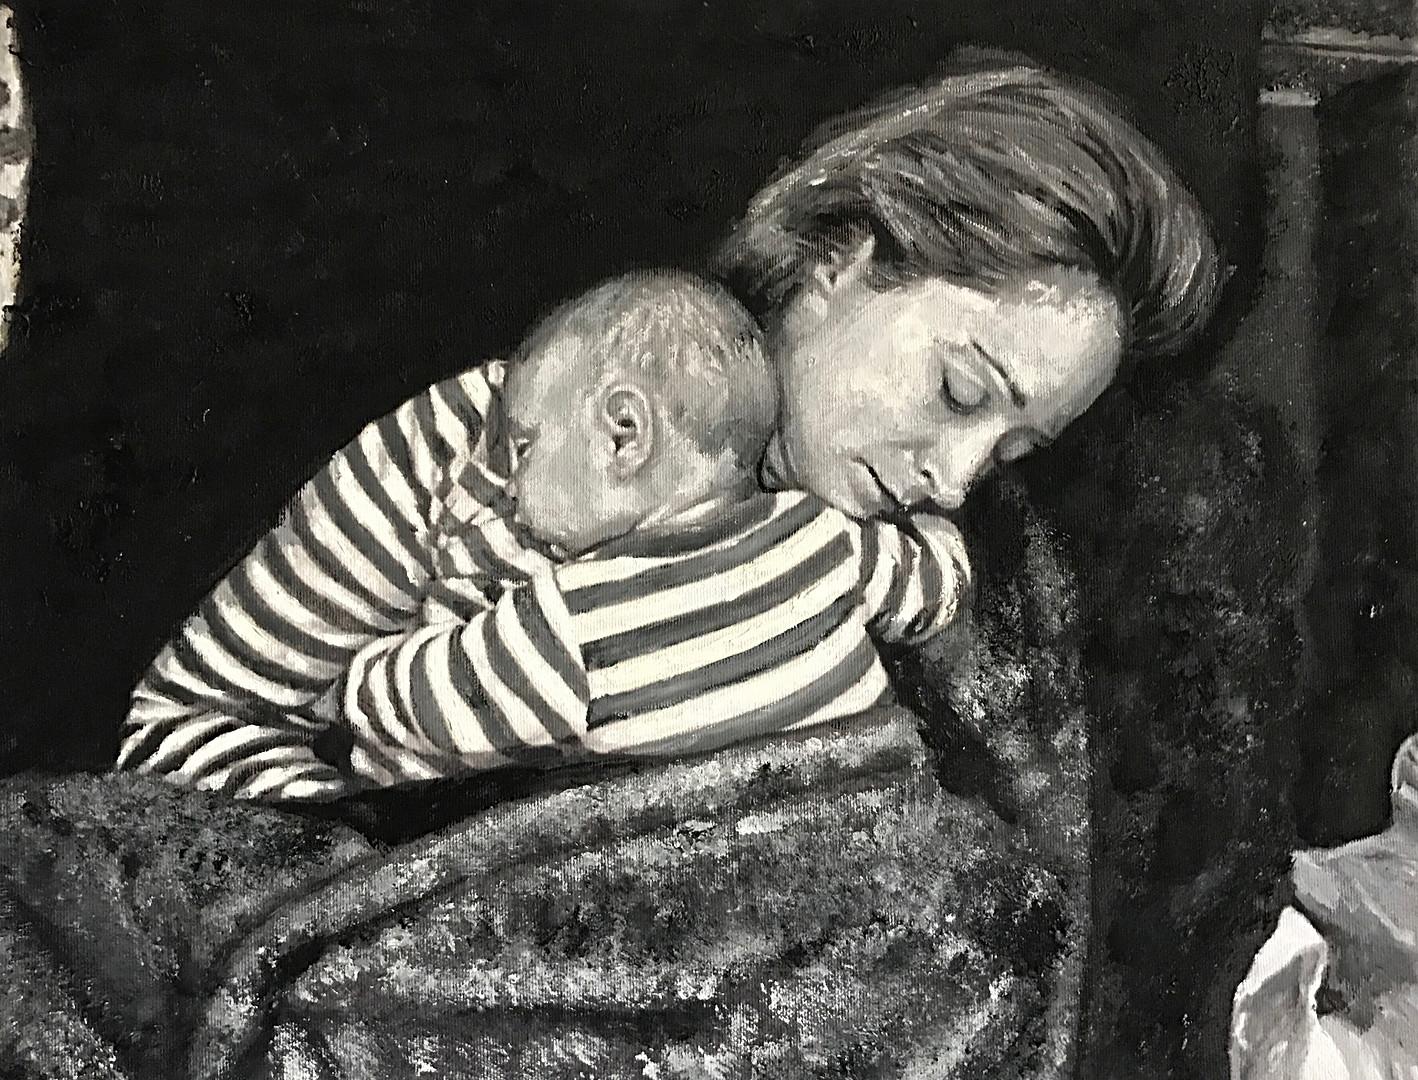 Diana and Luke Sleeping